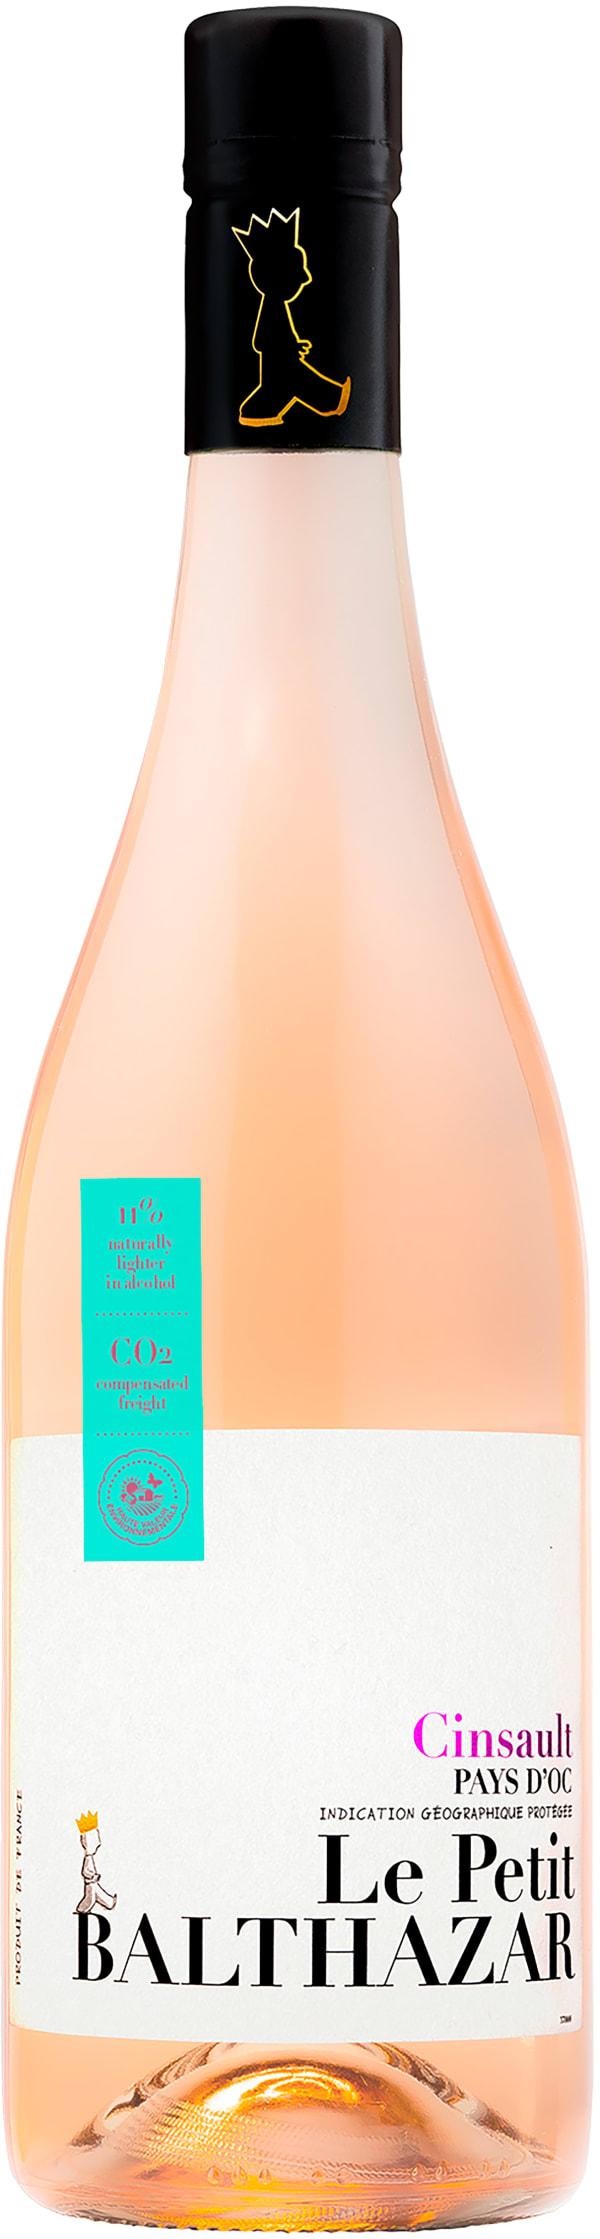 Le Petit Balthazar Cinsault Rosé 2017